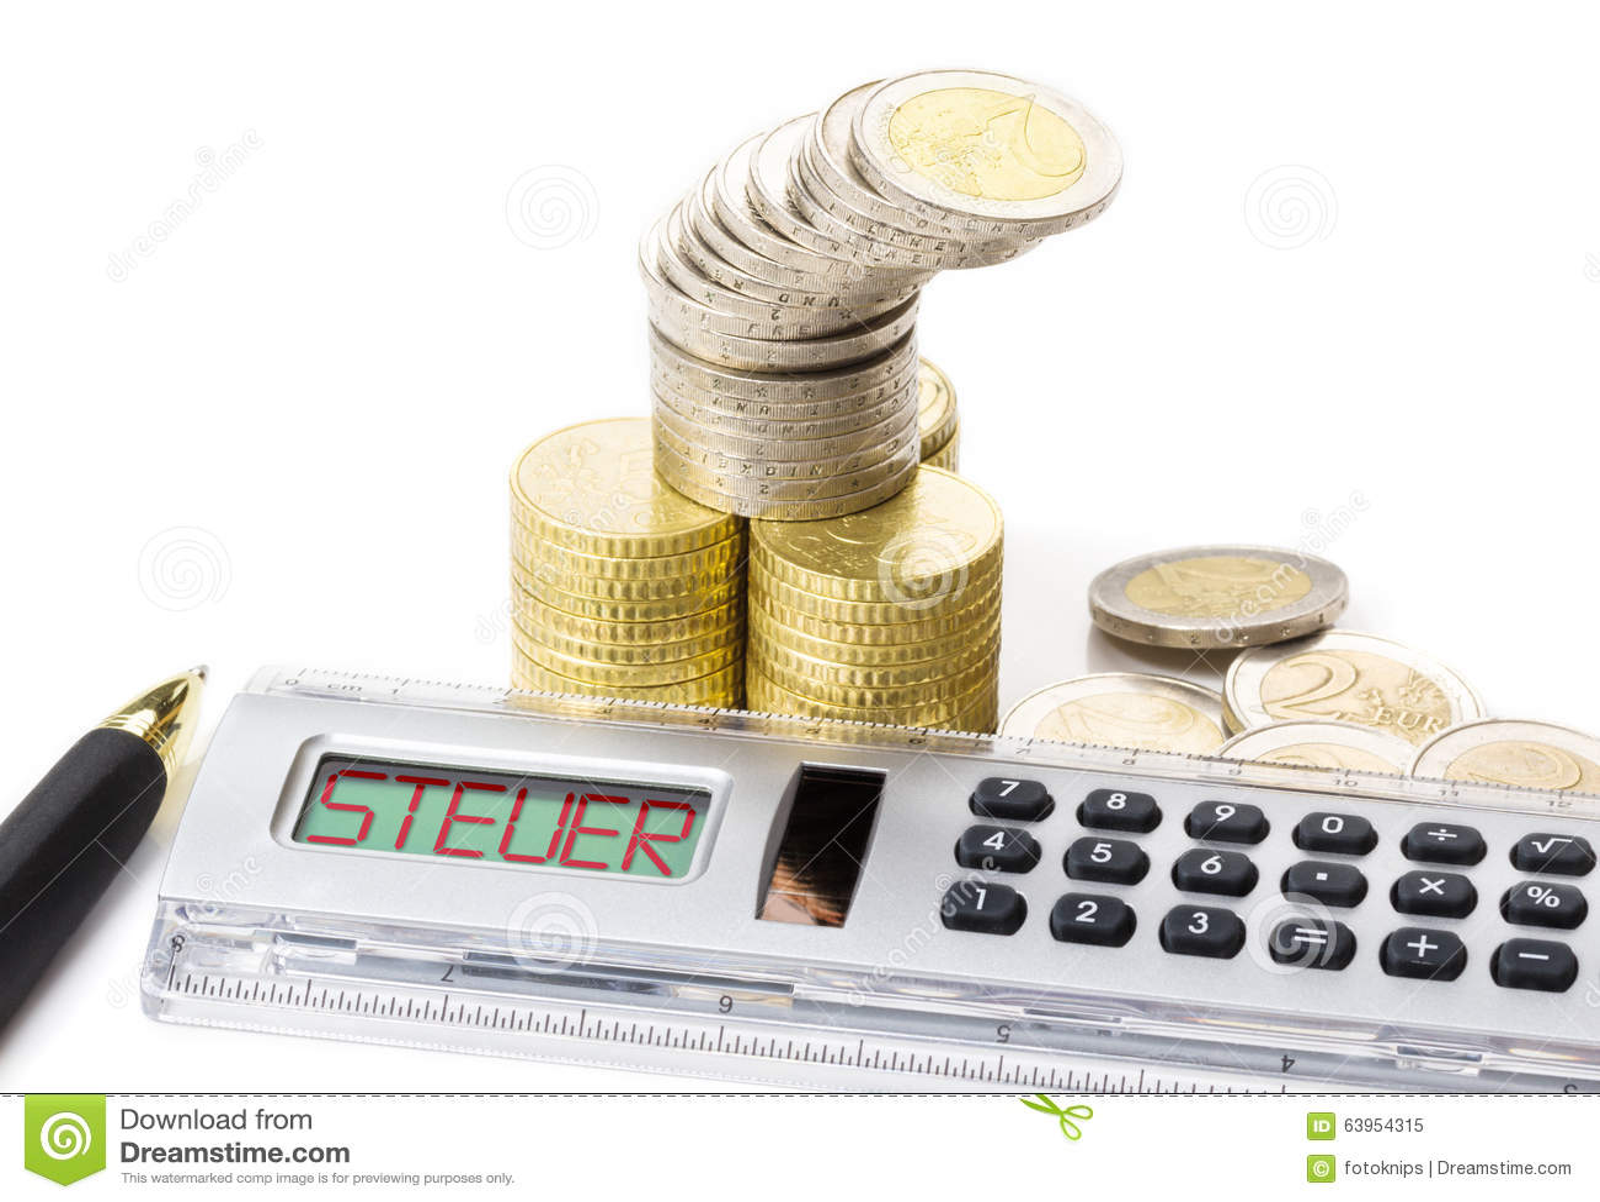 Calcule o imposto